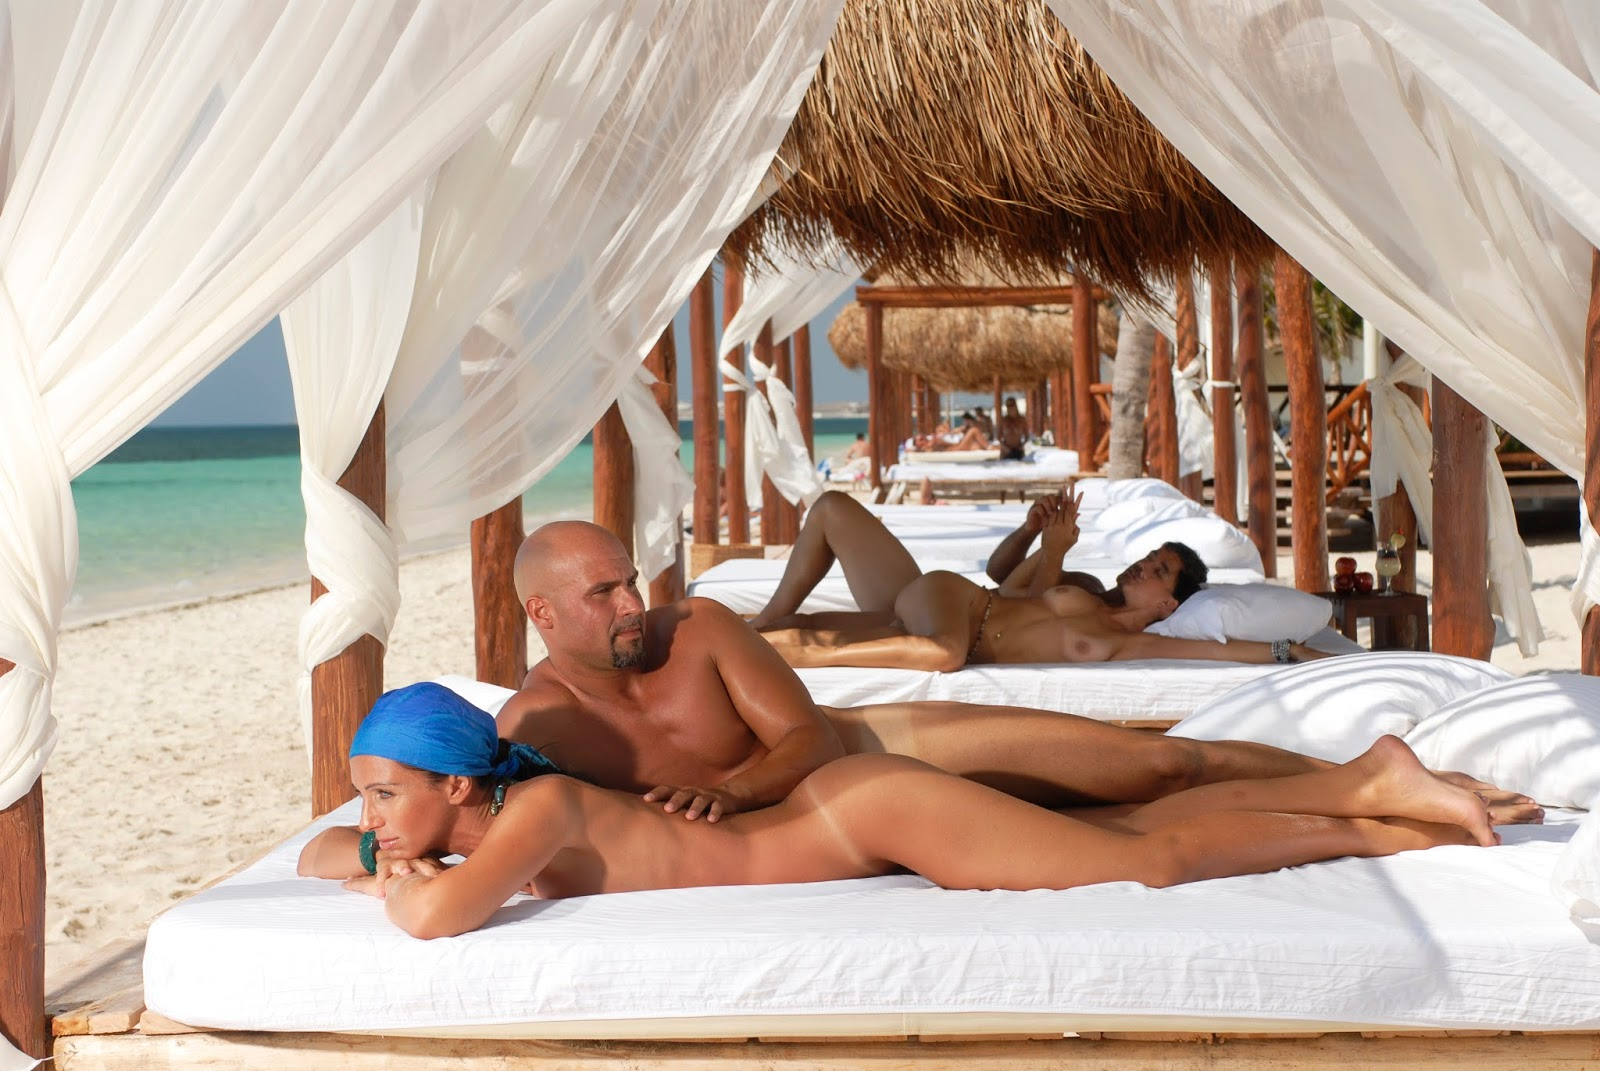 Mexico Sex Vacation-8542